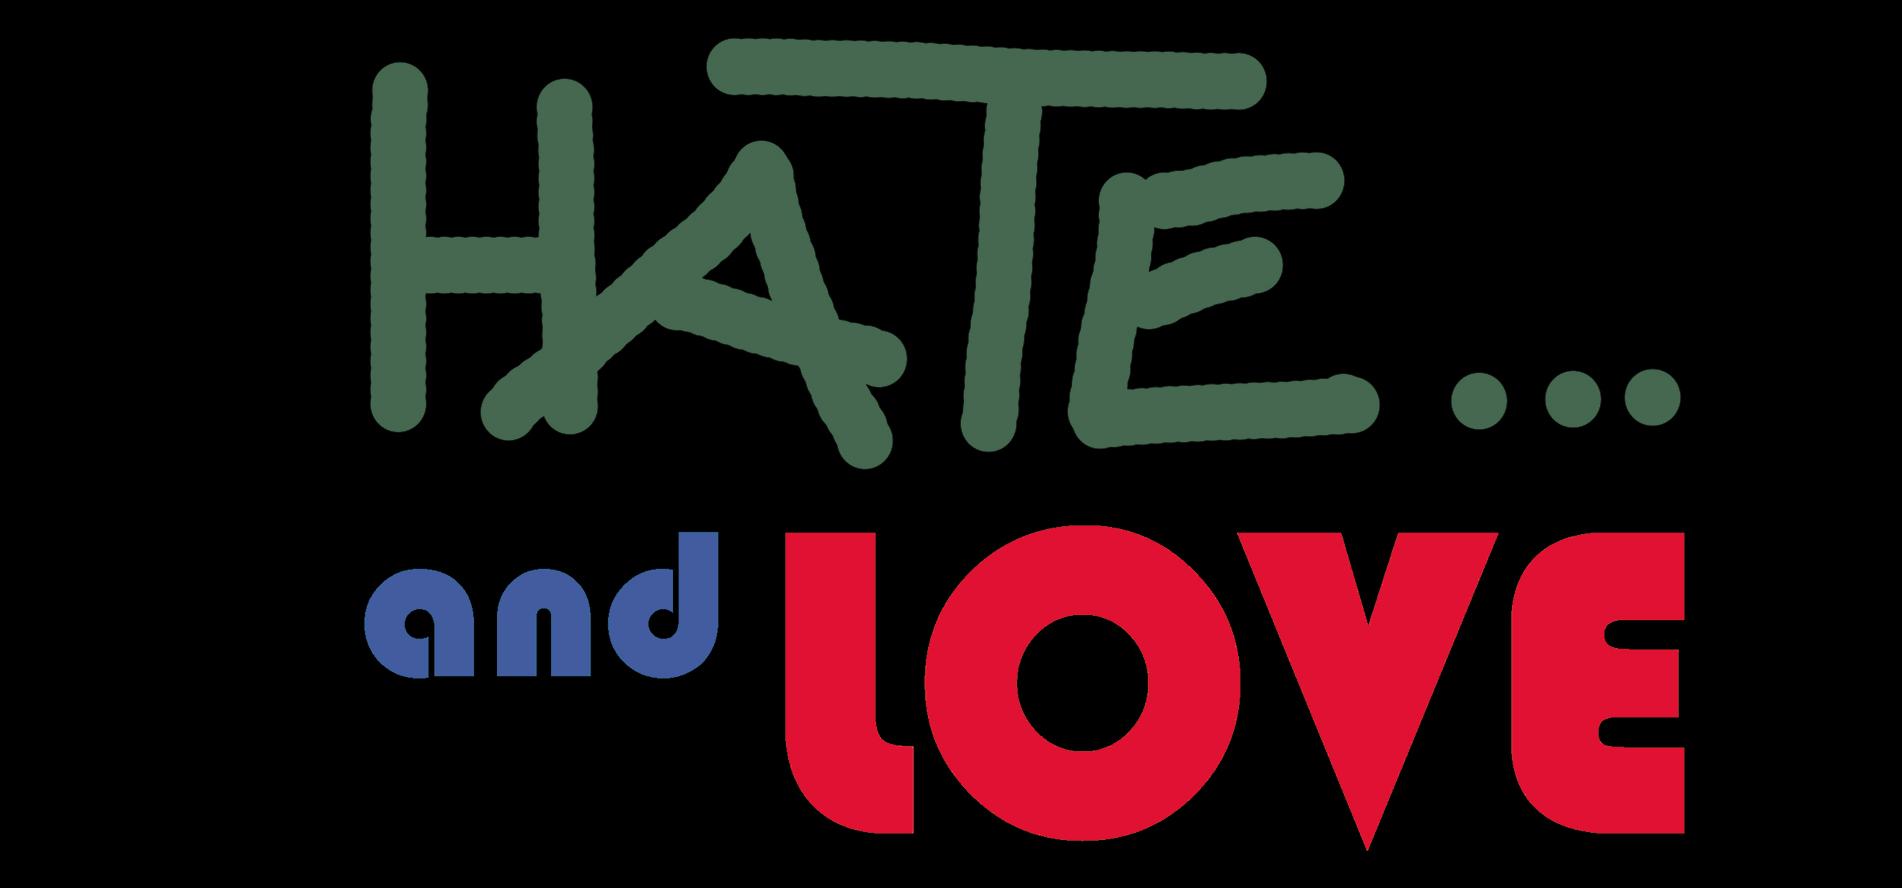 Hate and Love 2.jpg